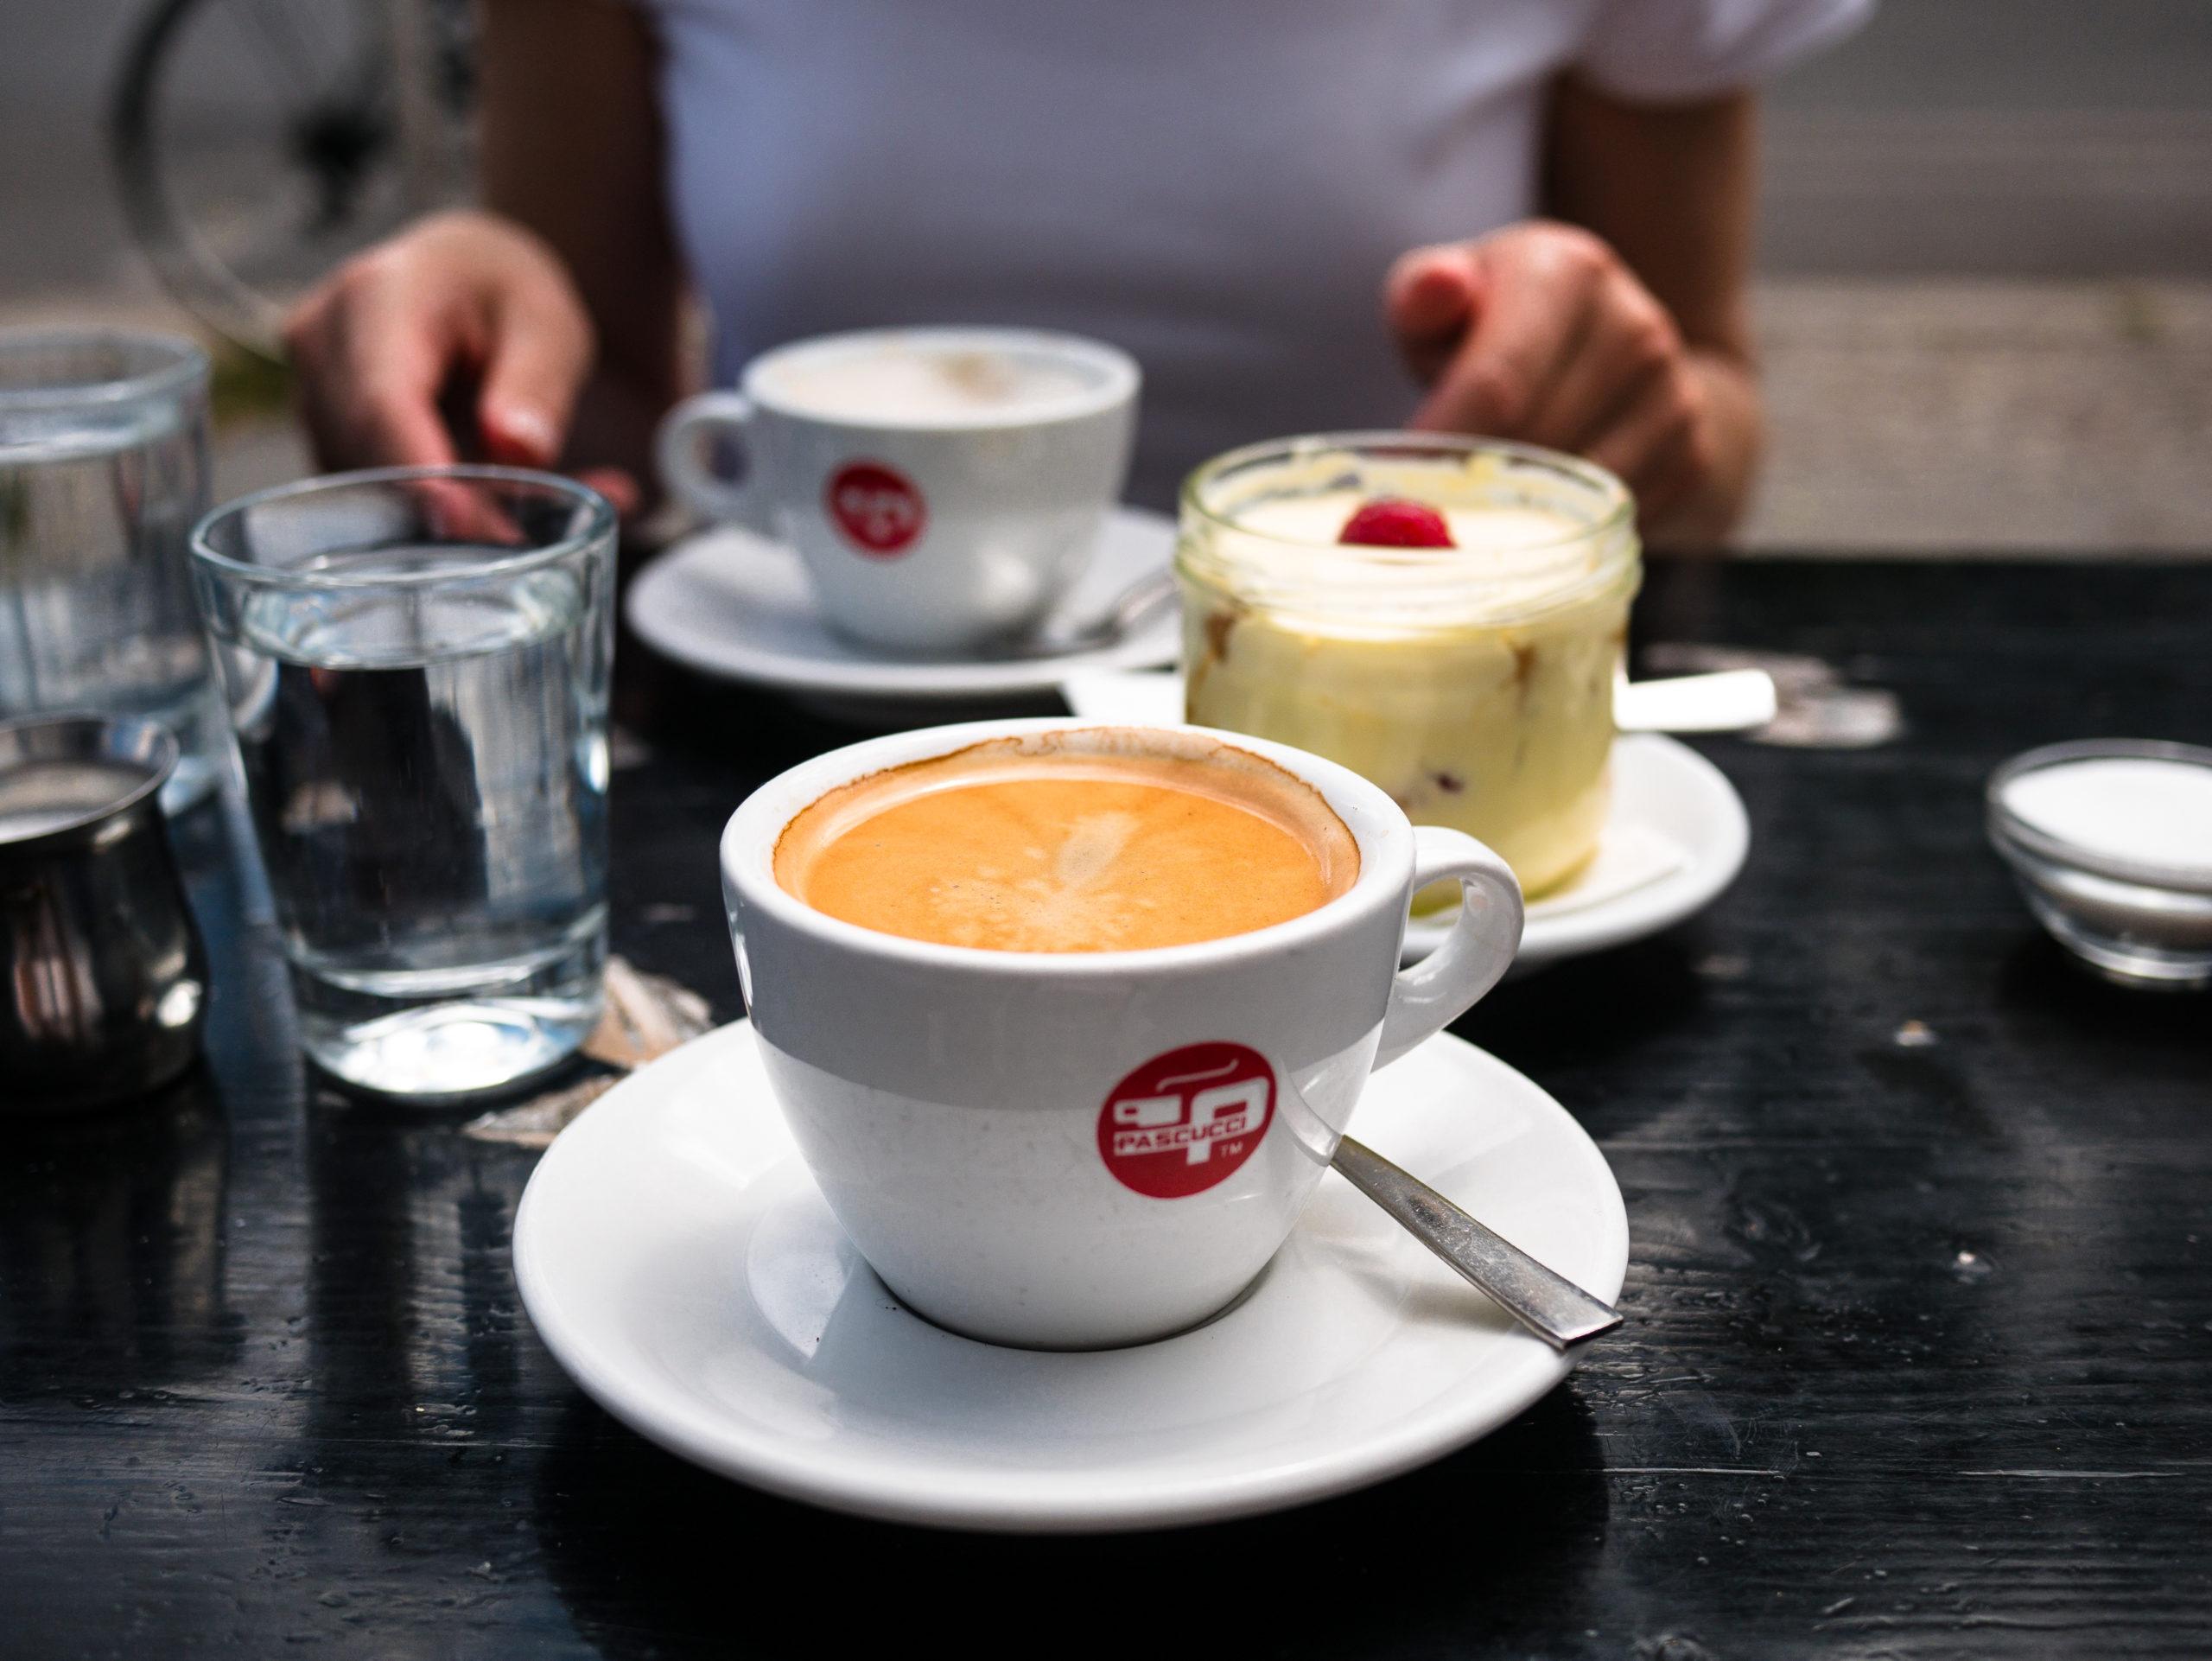 Bar Italia Kreuzberg italienisch Frühstück Kaffee